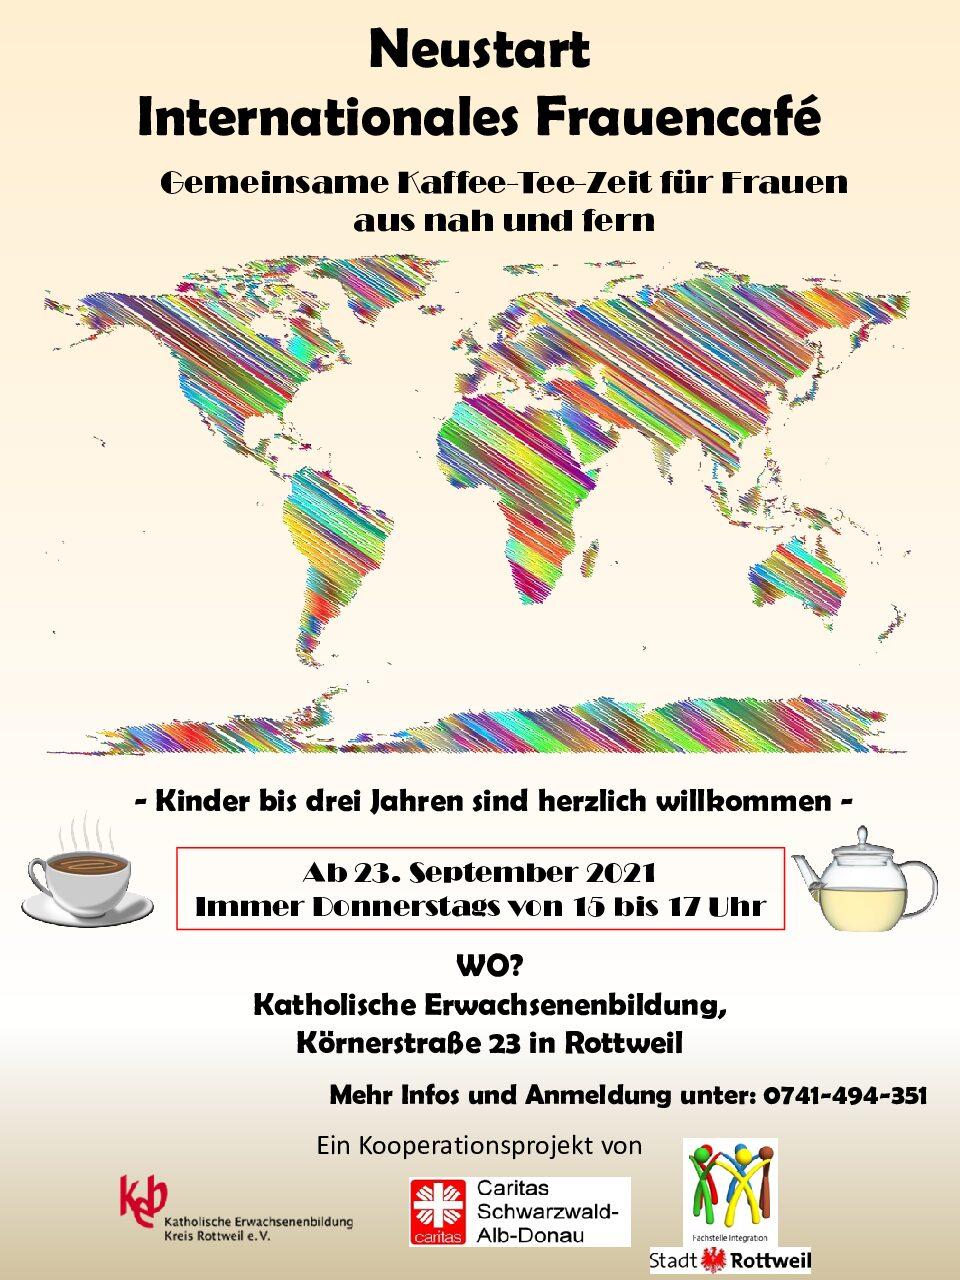 Neustart Internationales Frauencafé am 23.09.2021